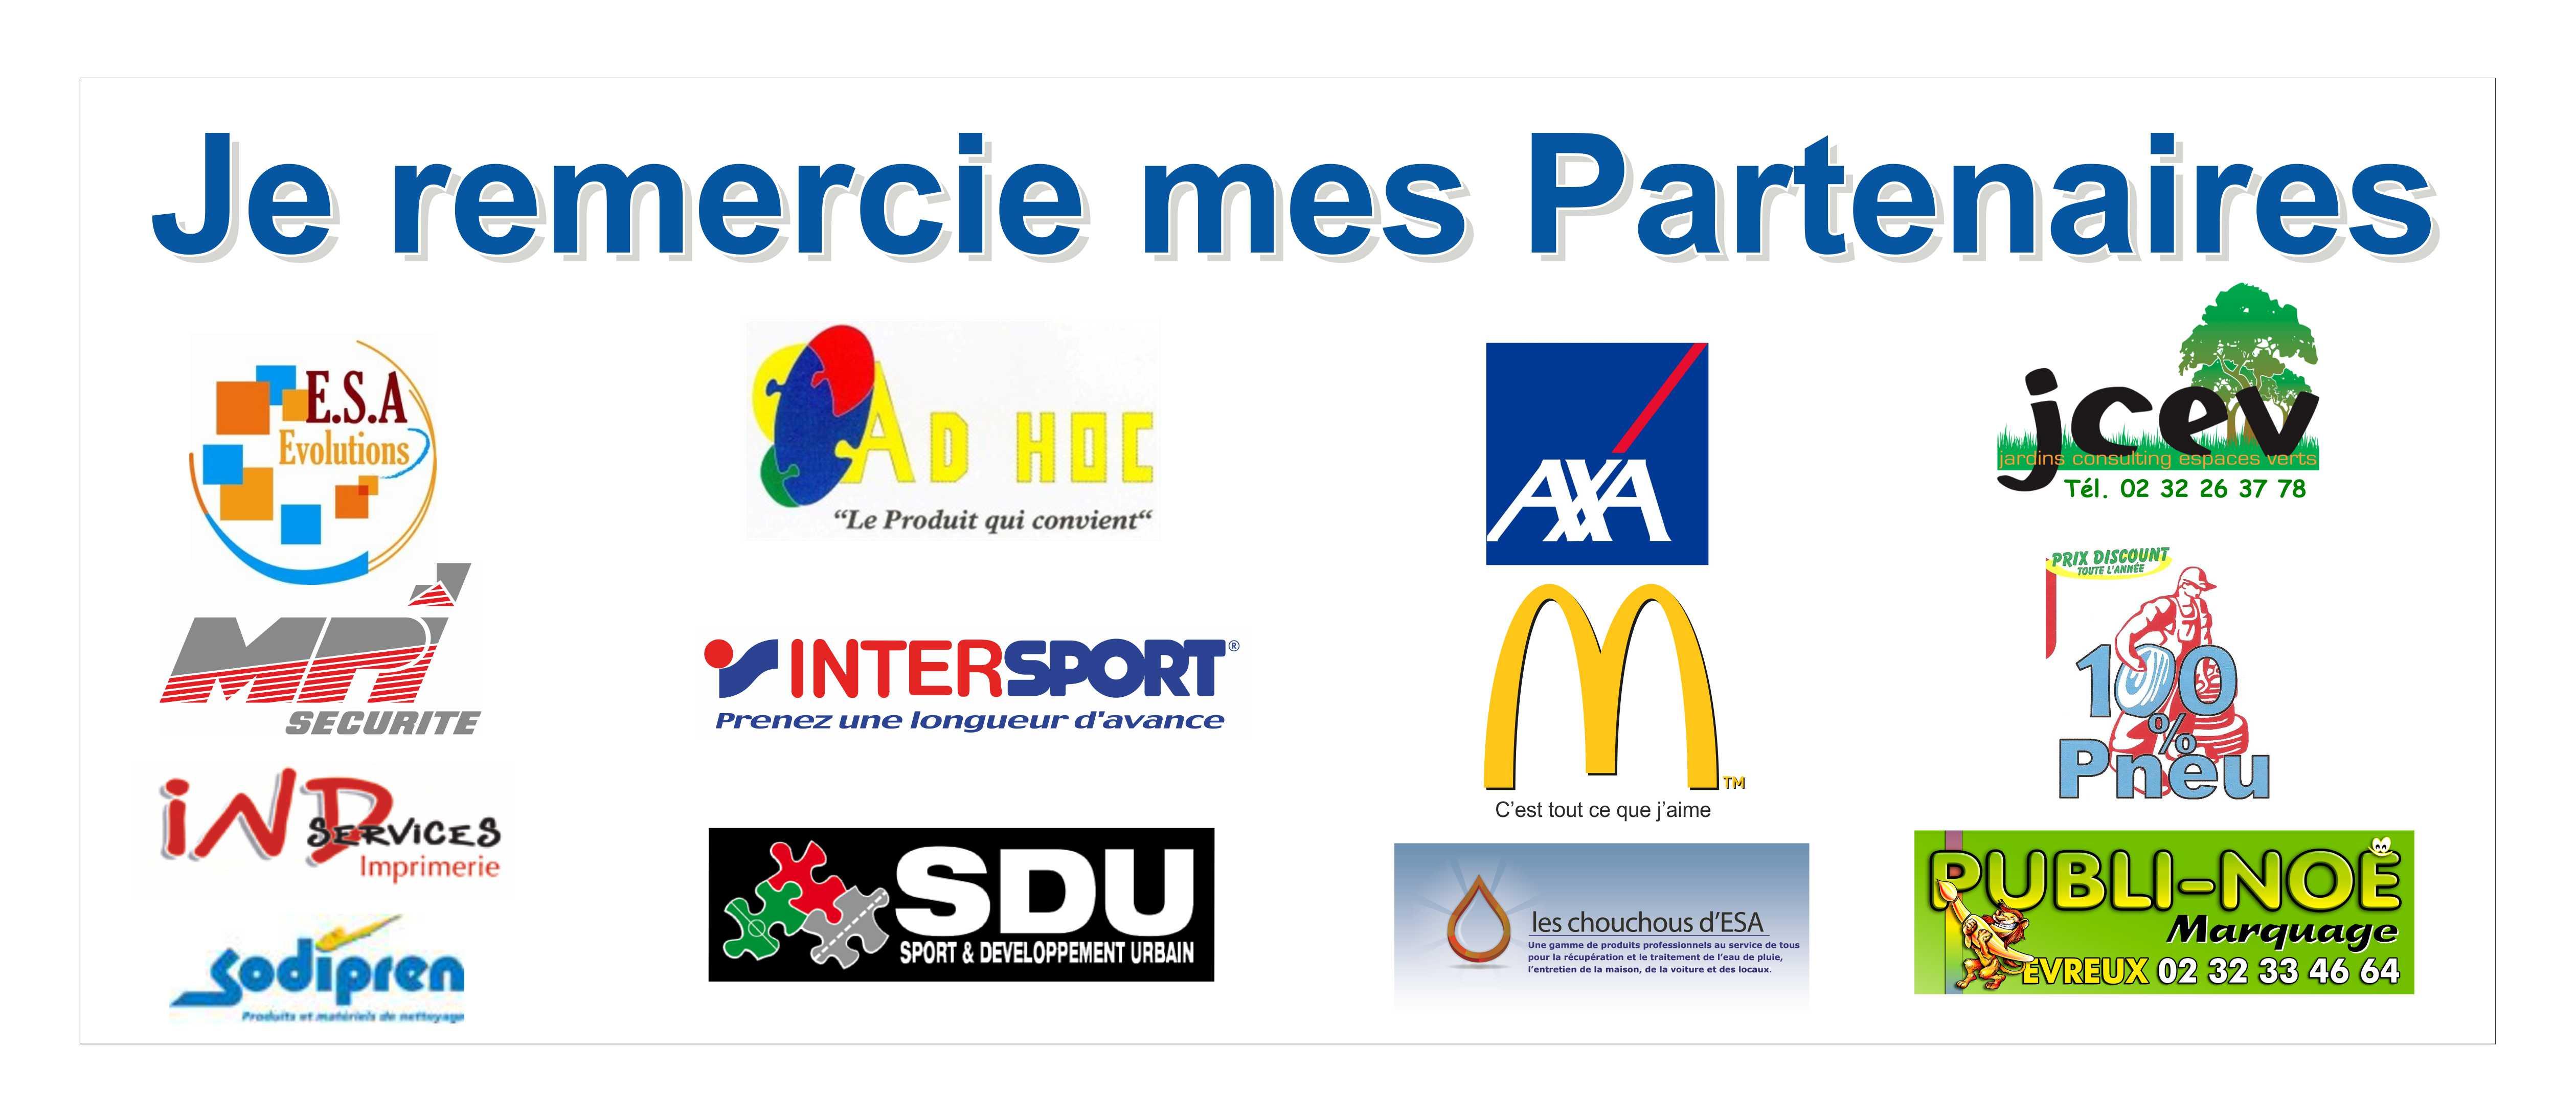 bache_sponsors-20131